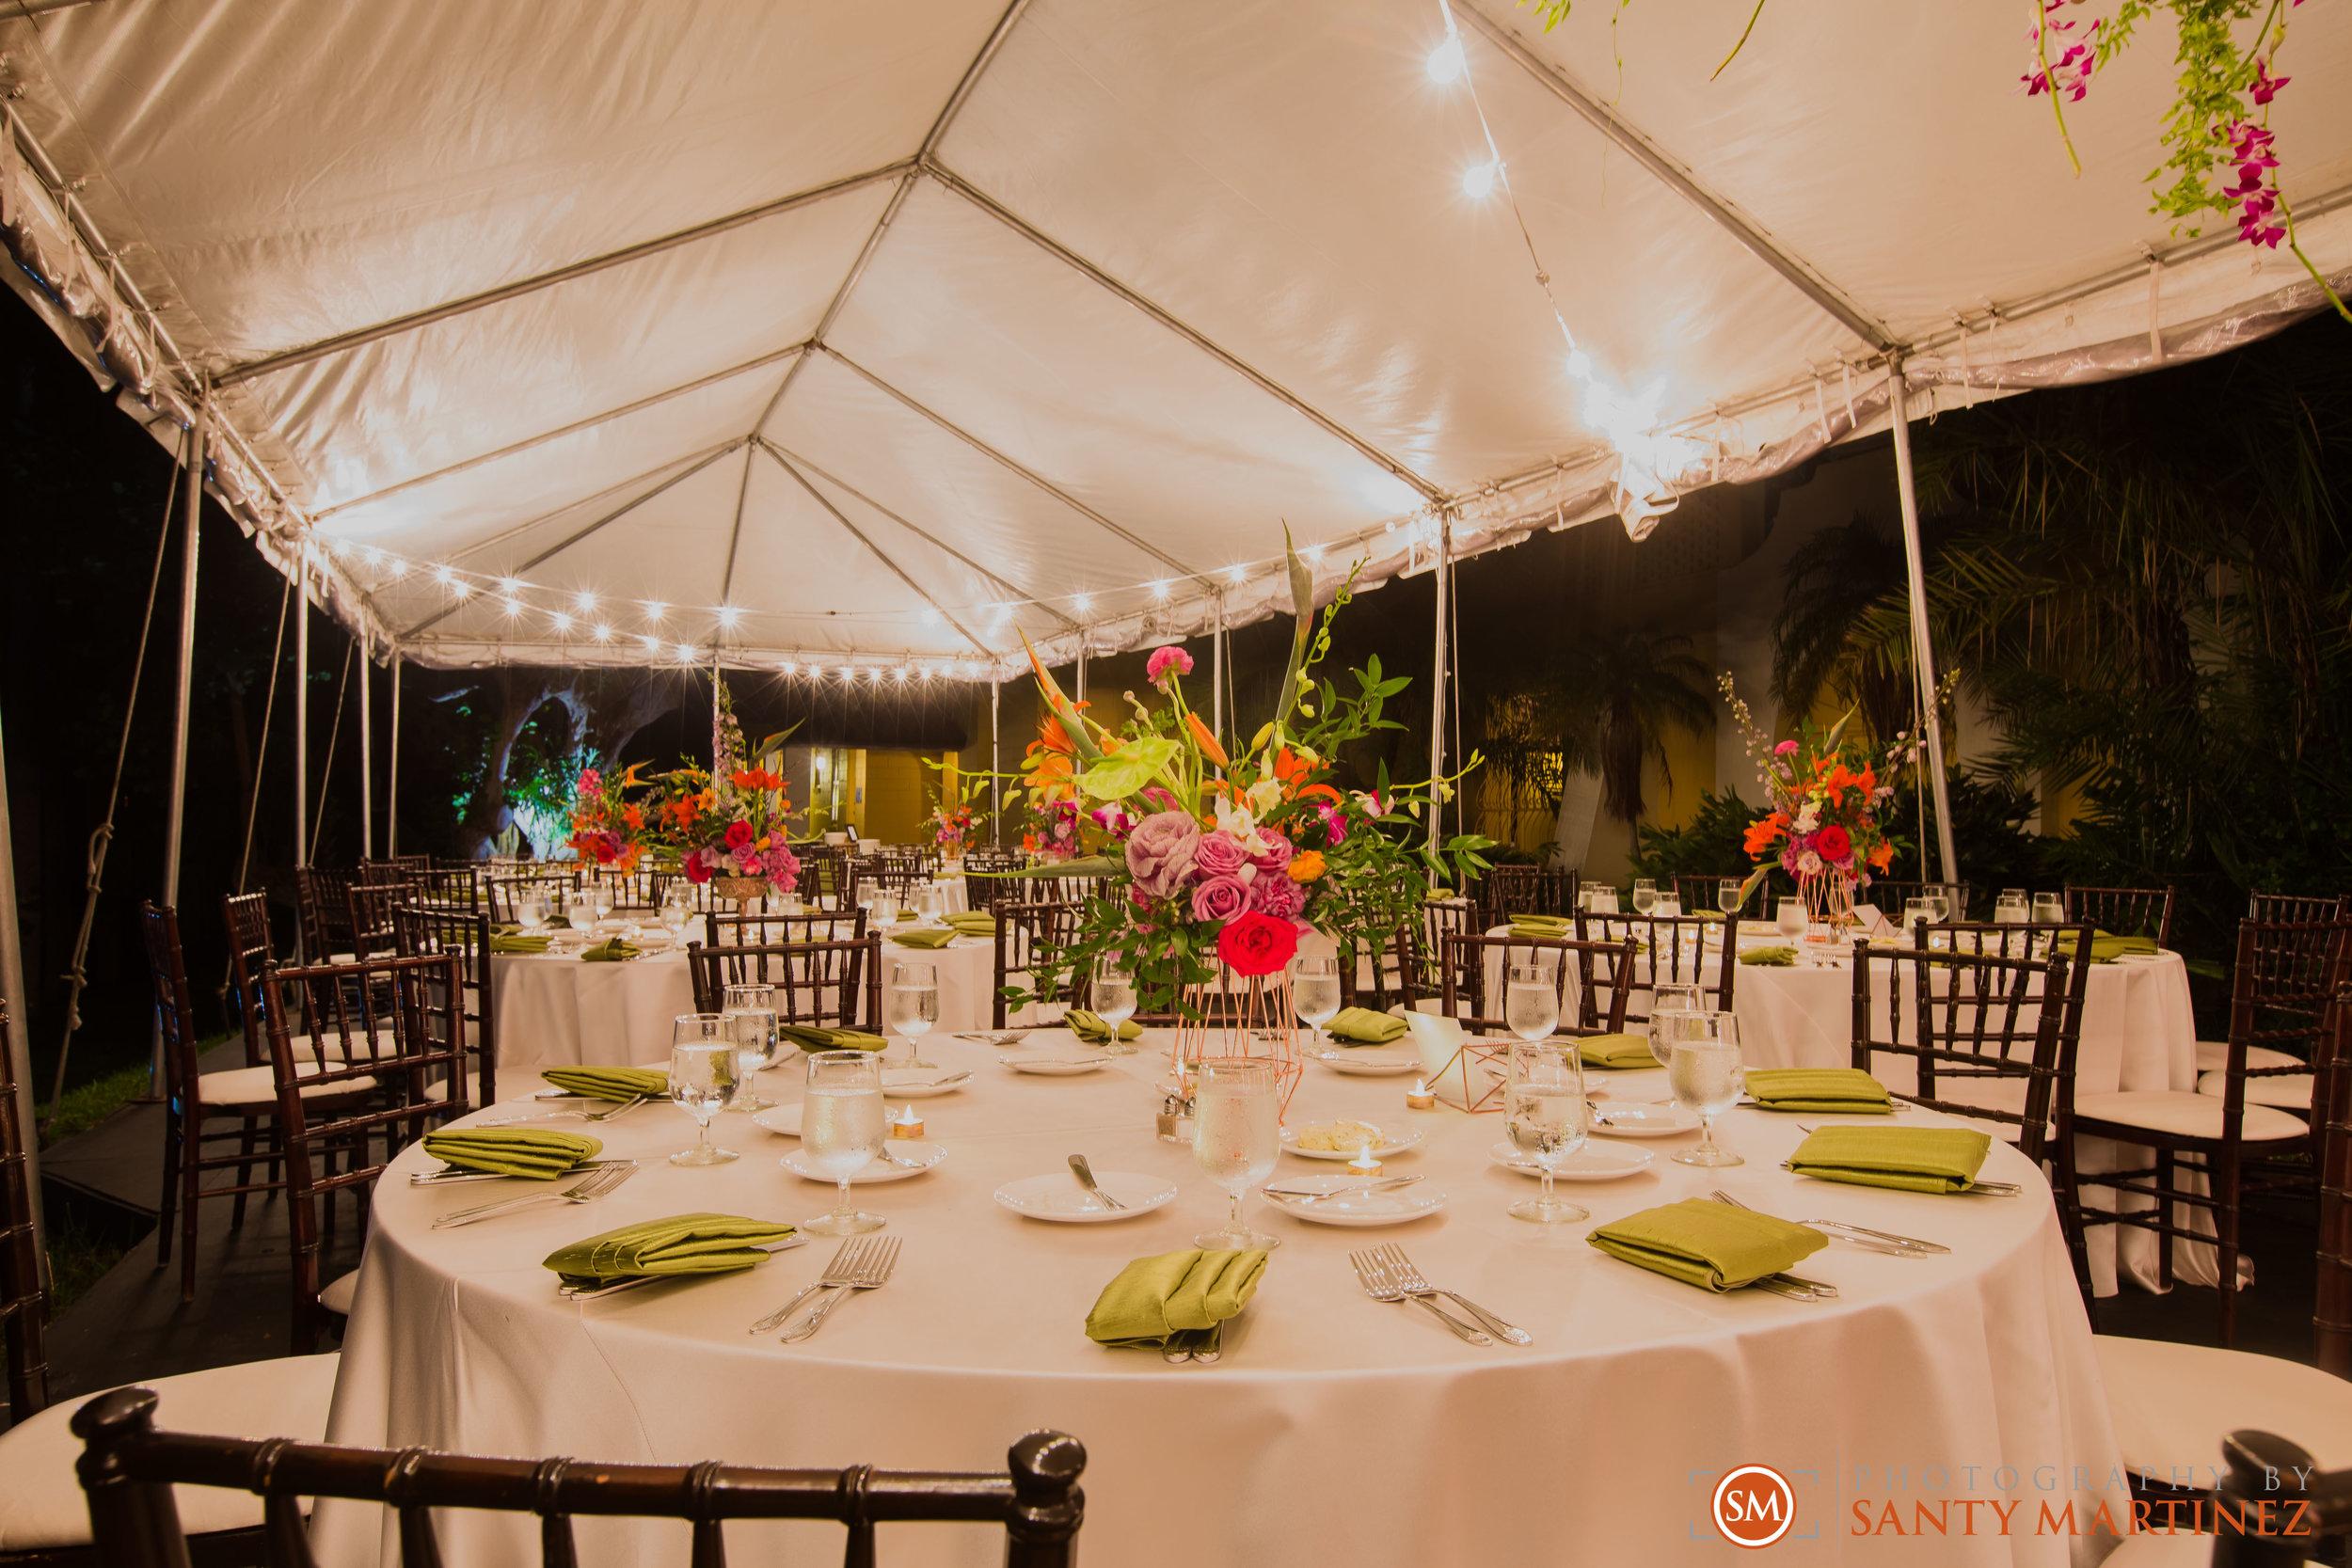 Wedding Bonnet House - Photography by Santy Martinez-37.jpg